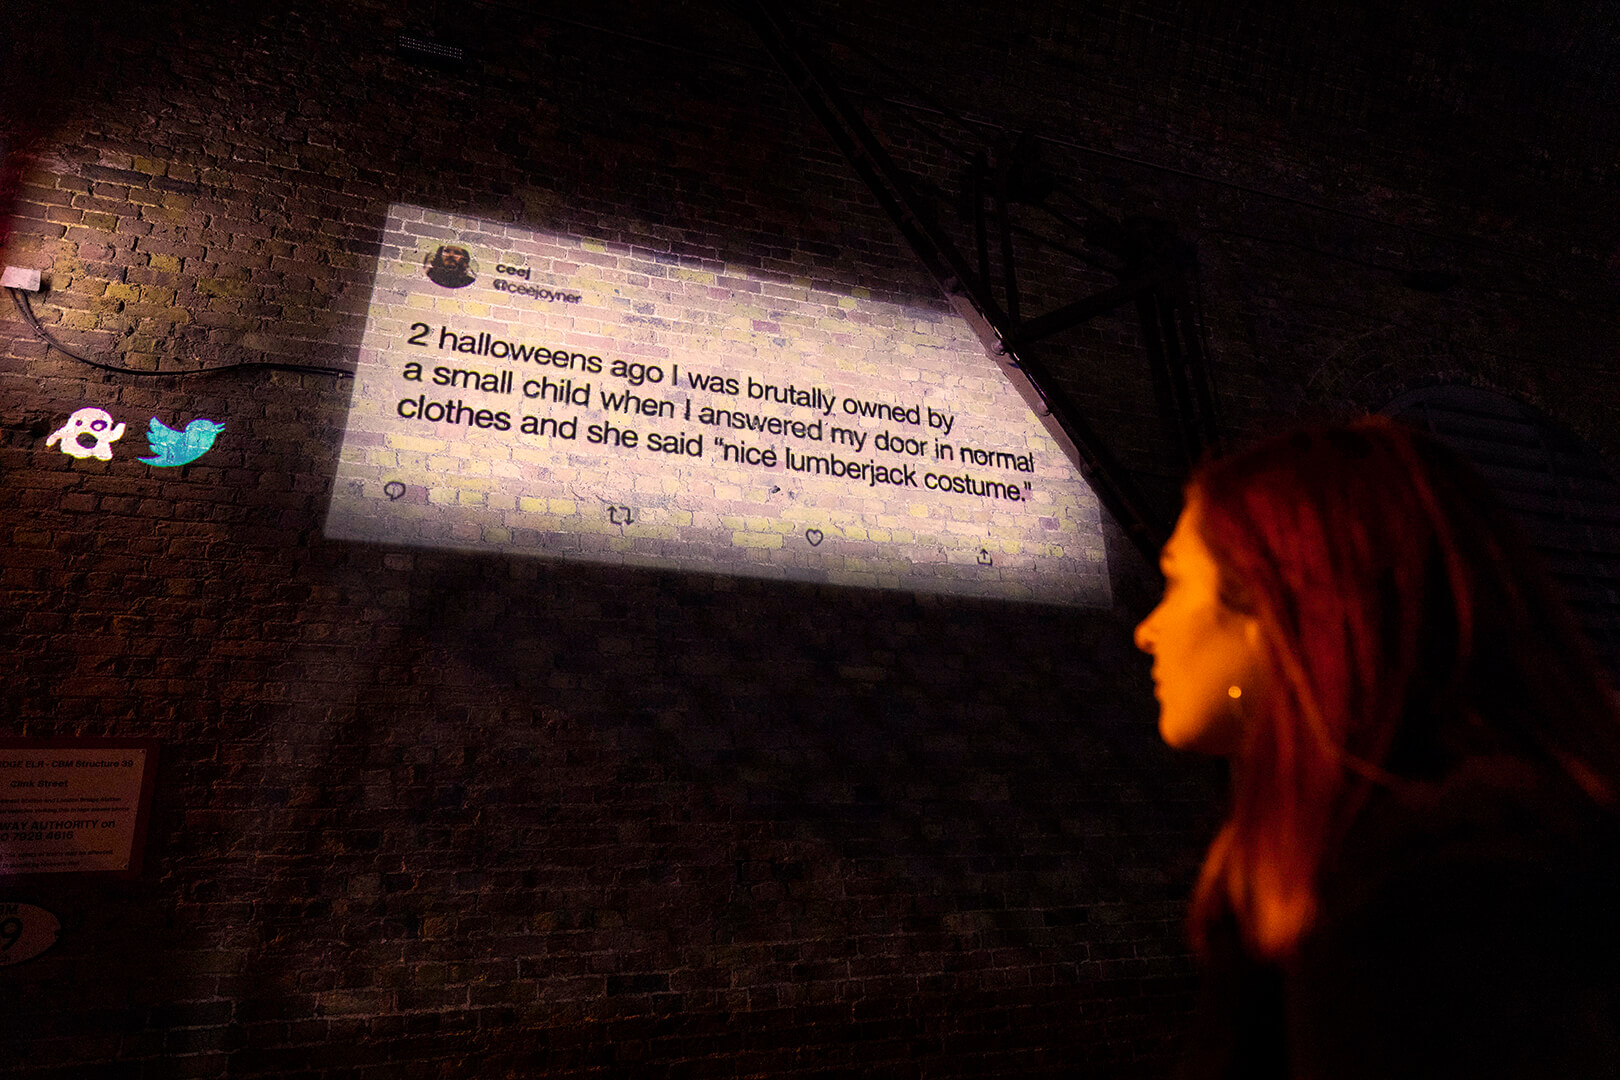 20201025_Twitter_UK_Halloween_1703_LFedit_2MB2